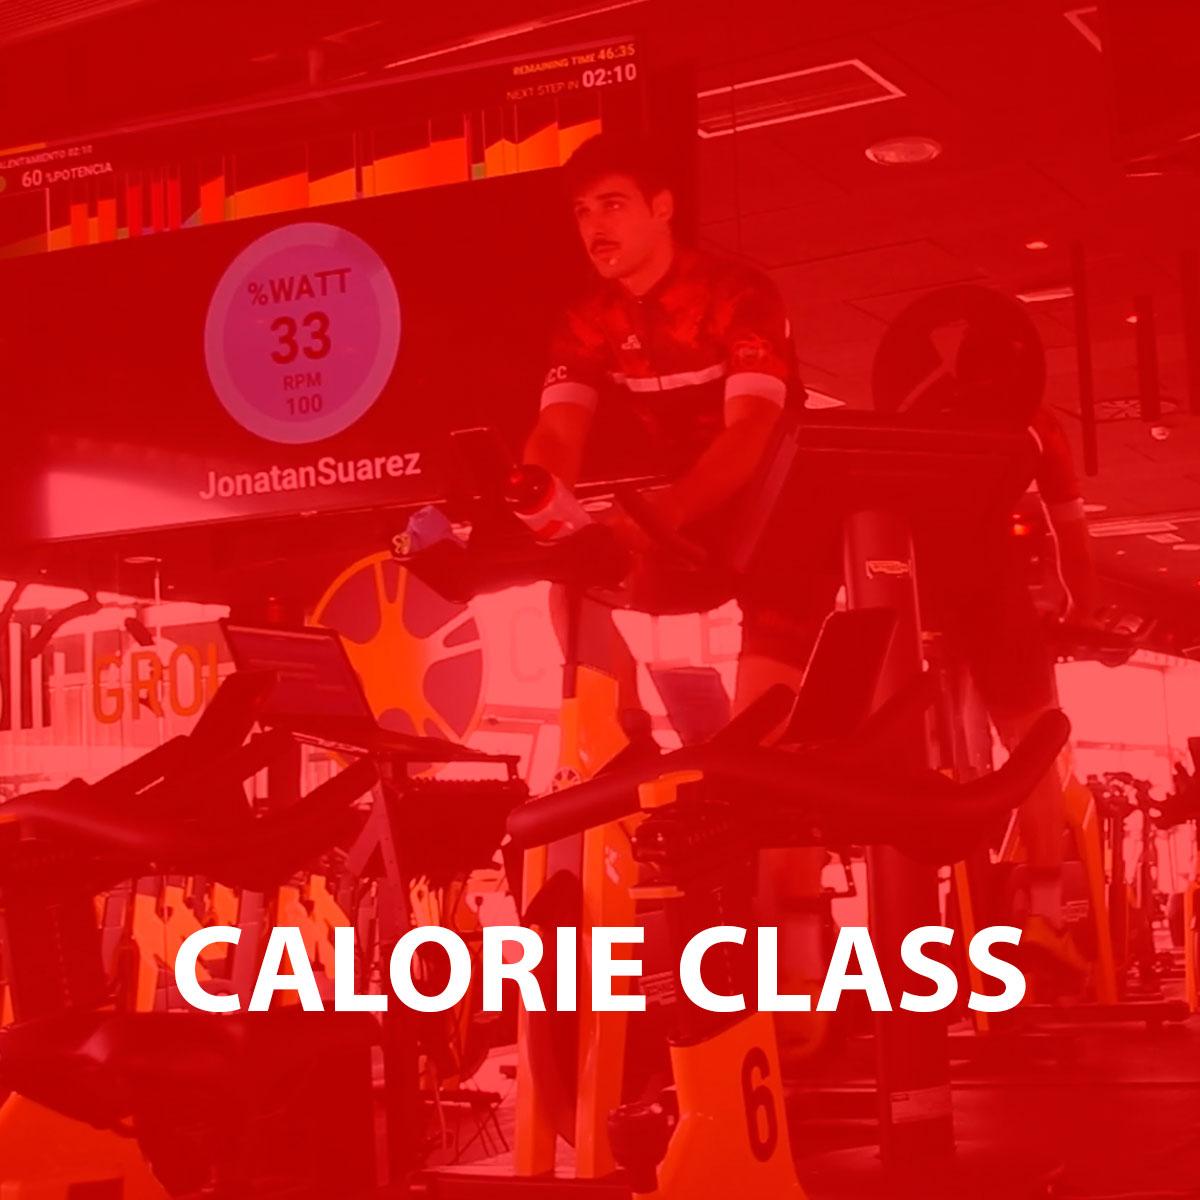 Calorie Class